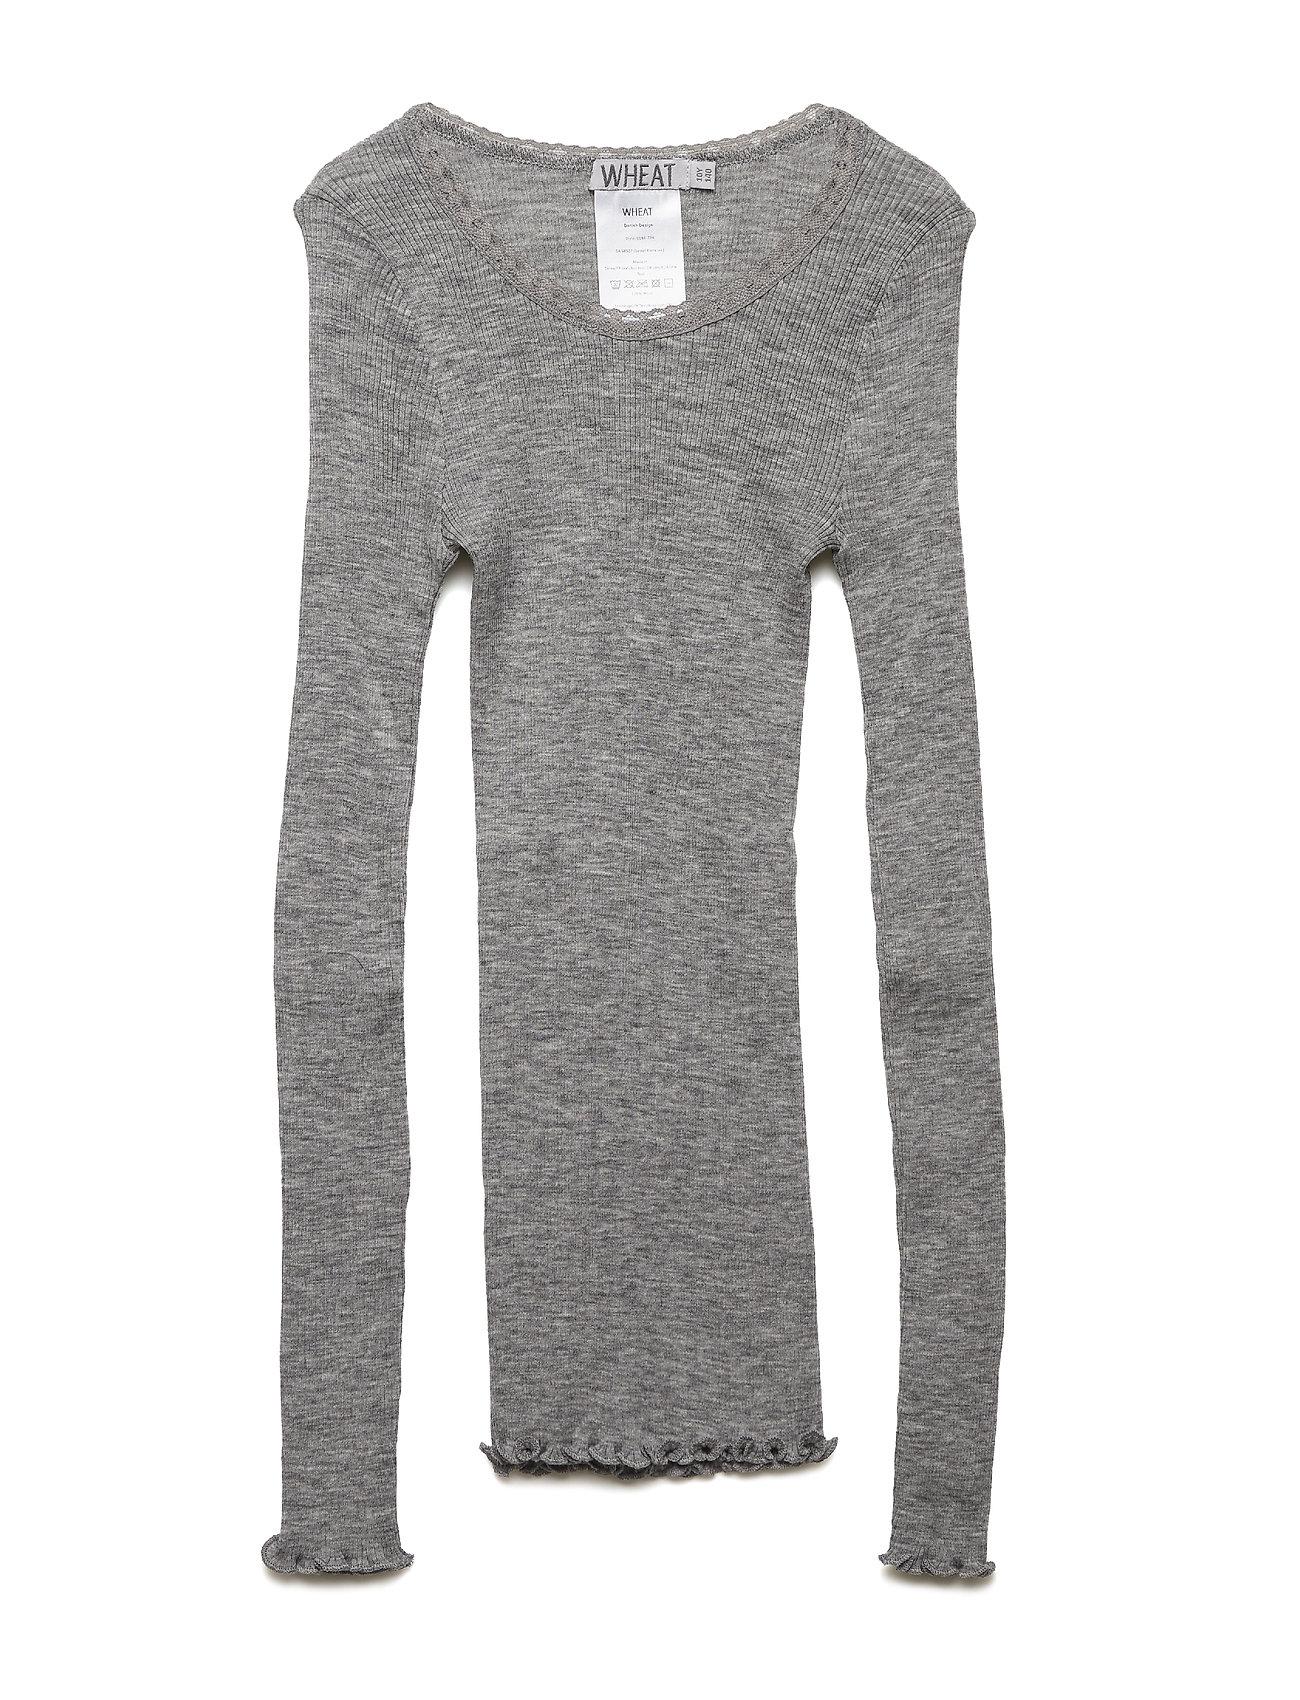 Wheat Wool Rib T-shirt LS - MELANGE GREY